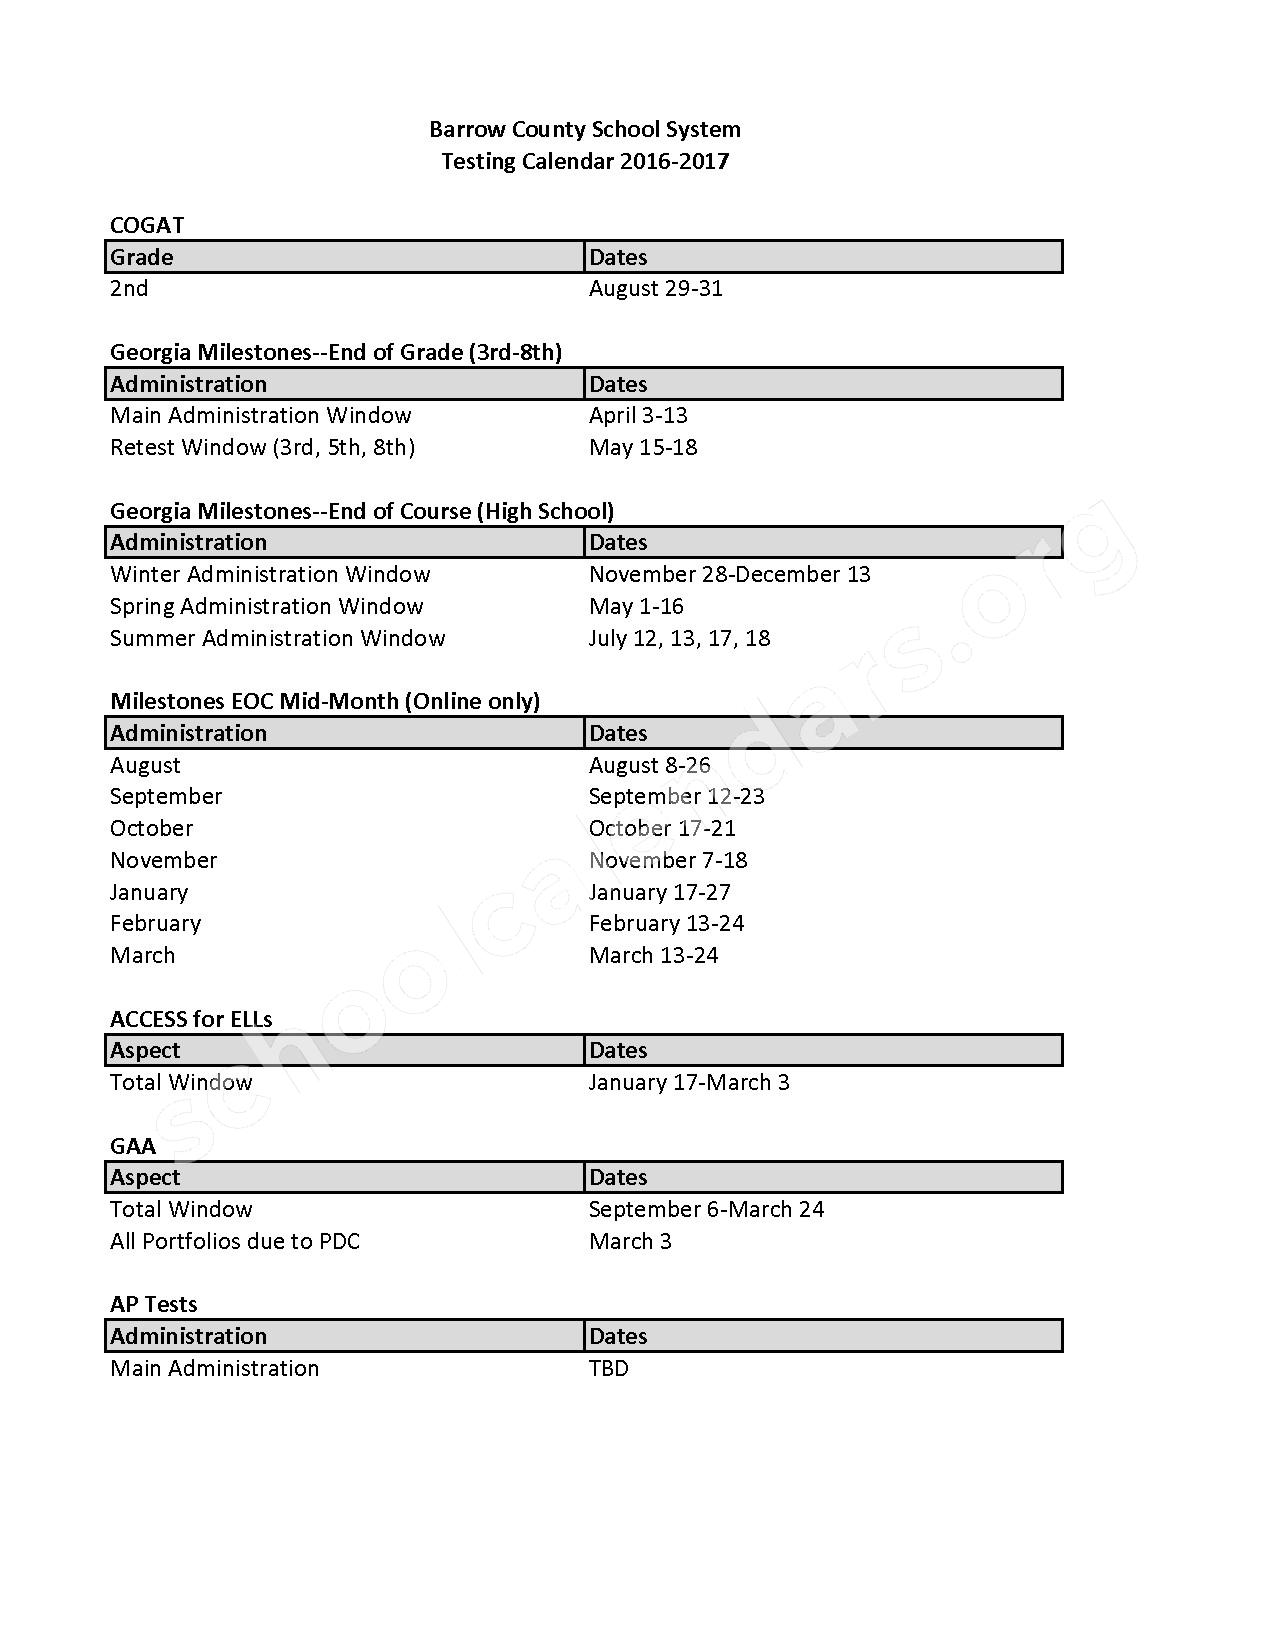 2016 - 2017 Testing Calendar – Barrow County School District – page 1